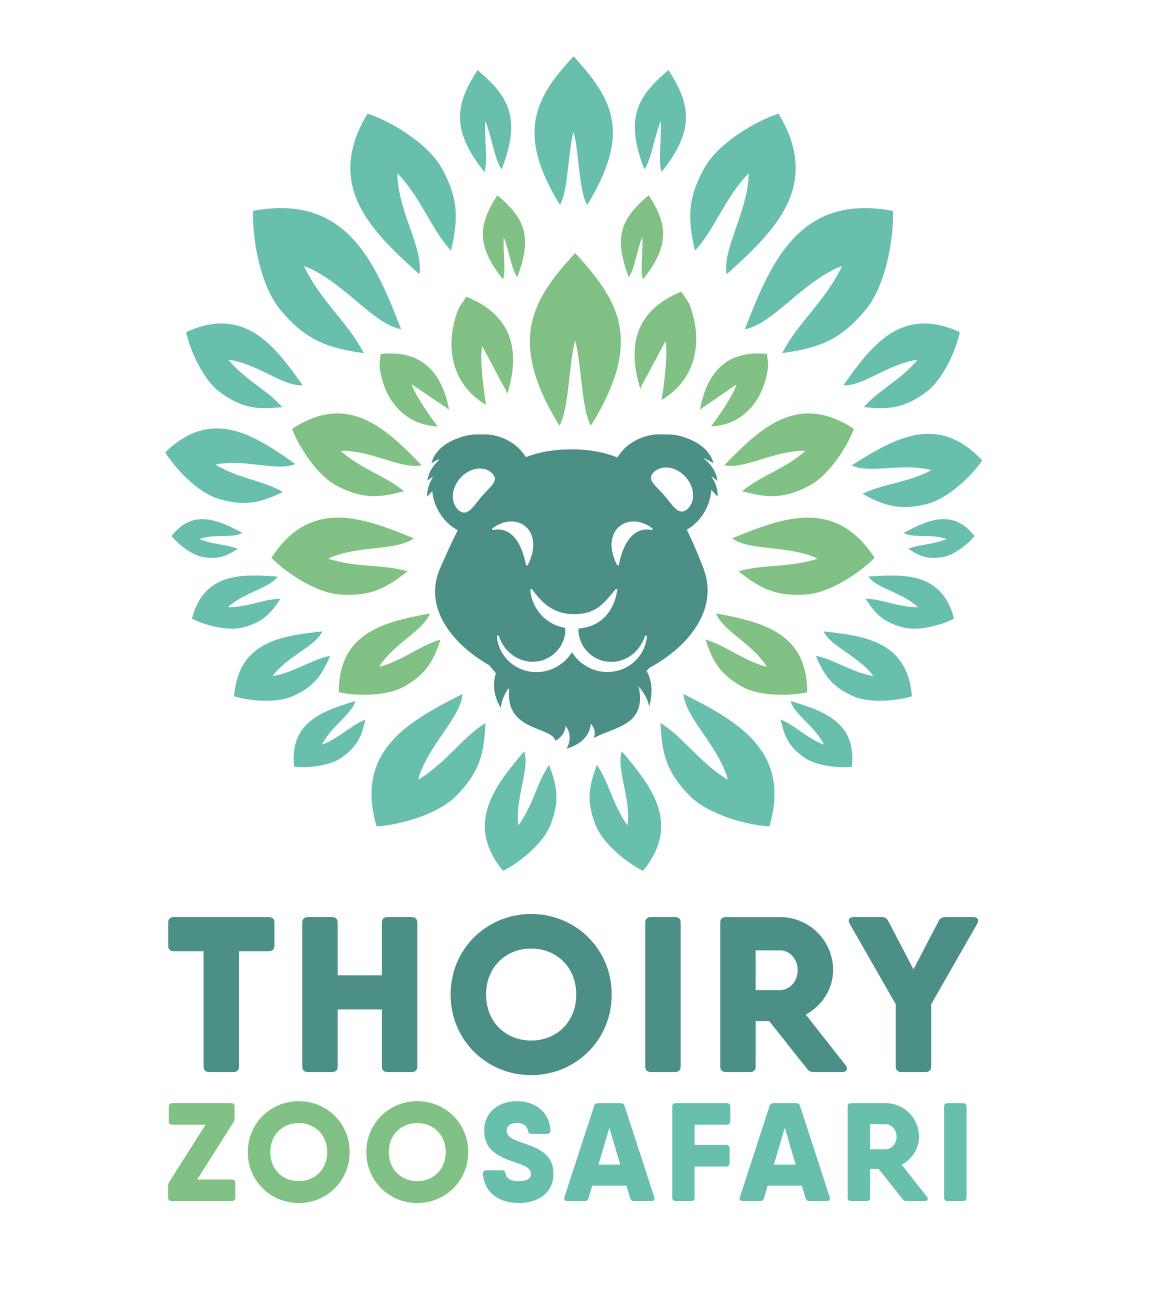 Thoiry Zoo Safari